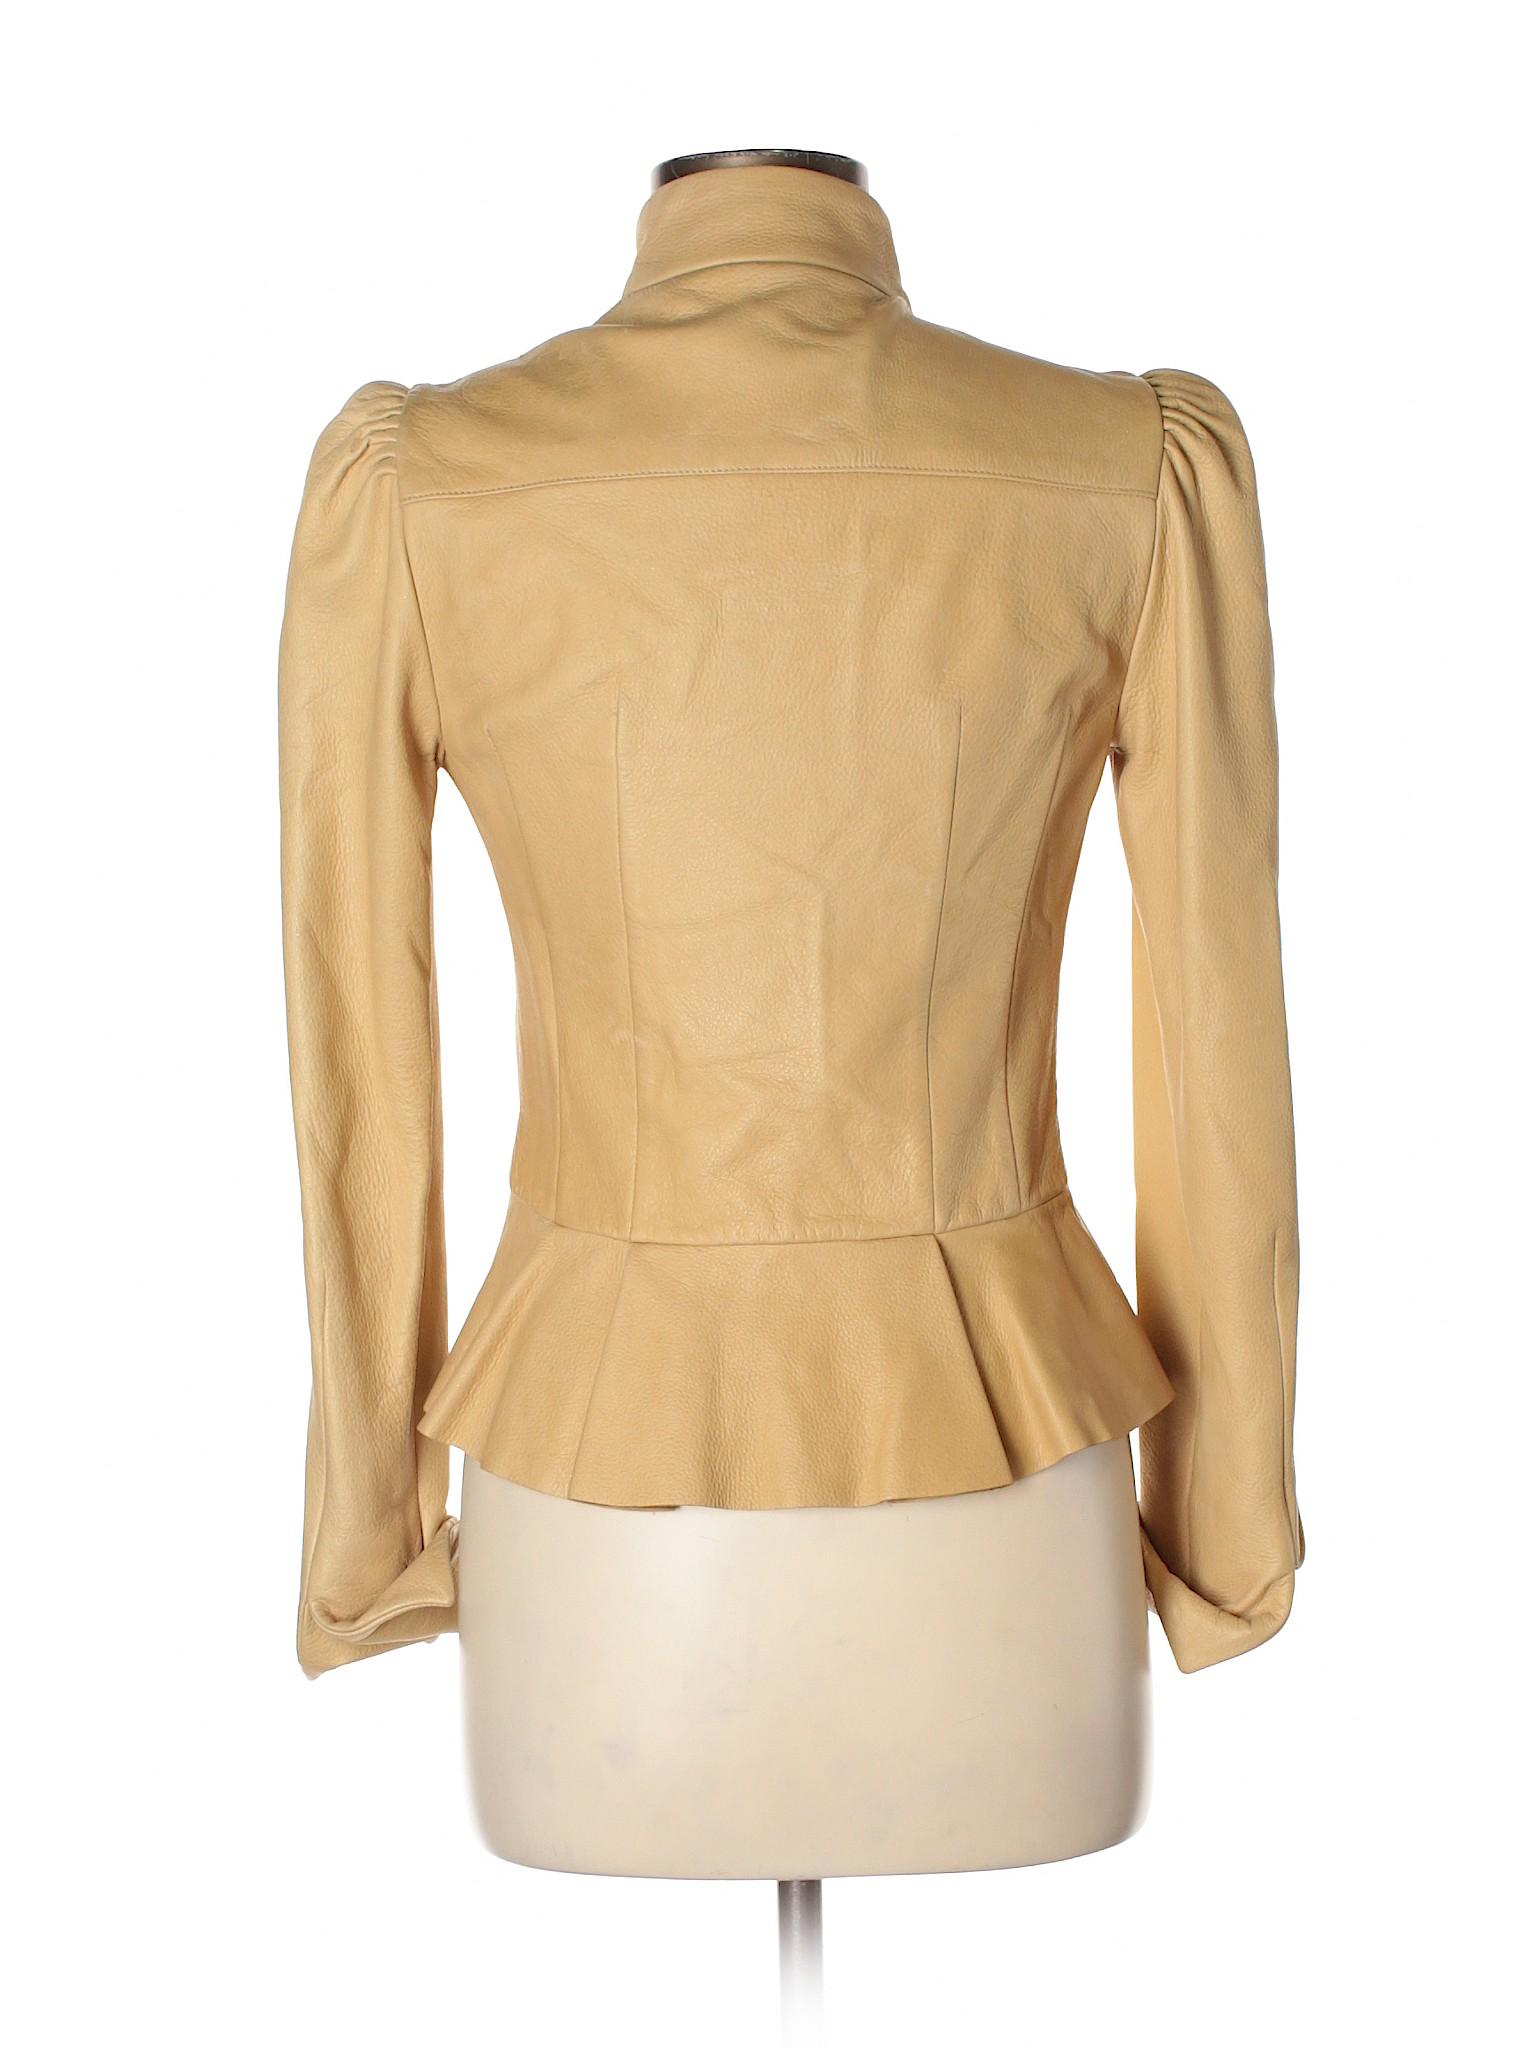 Ralph Jacket winter Leather Lauren Collection Boutique xAfwan8q4n